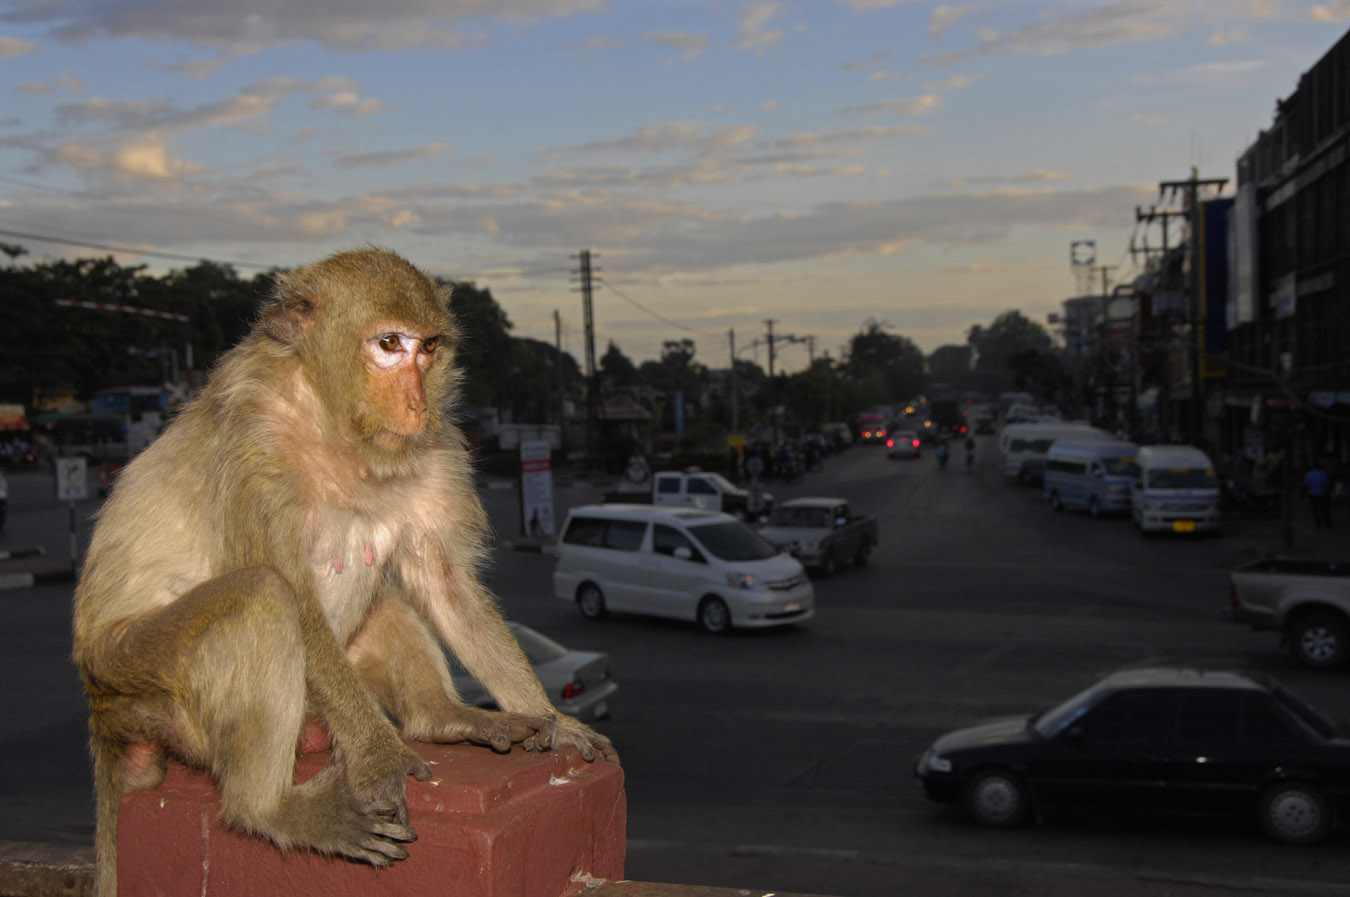 Richard Sobol S Story Of The Monkeys Of Lop Buri Thailand